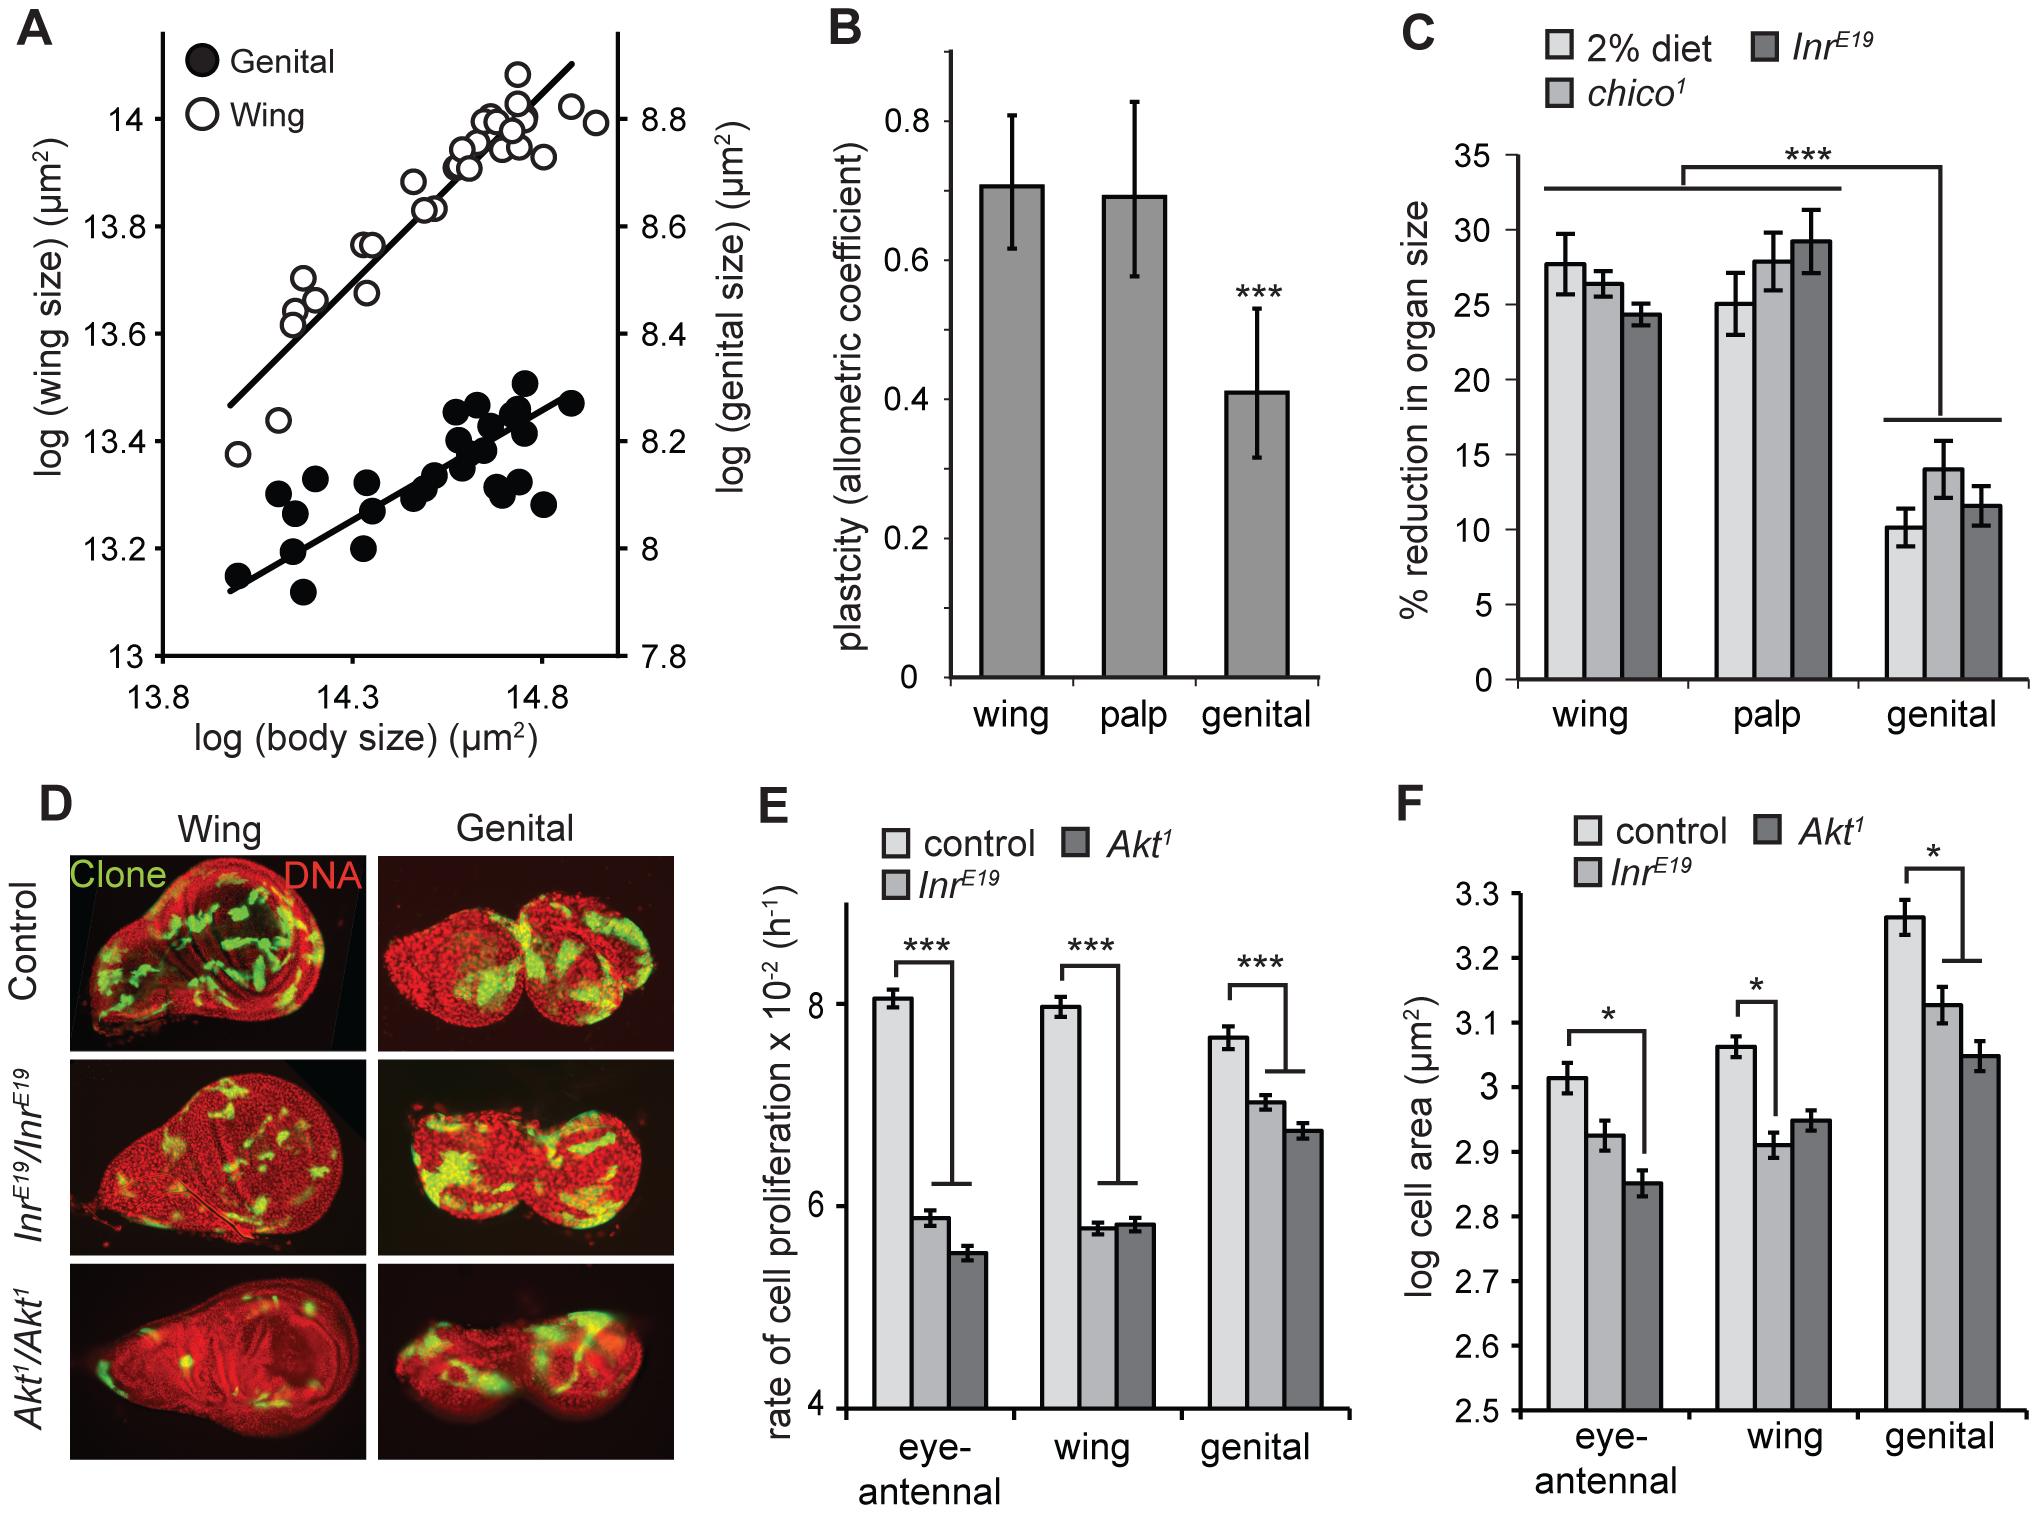 The genitalia of male <i>Drosophila</i> are nutrition- and insulin-insensitive.